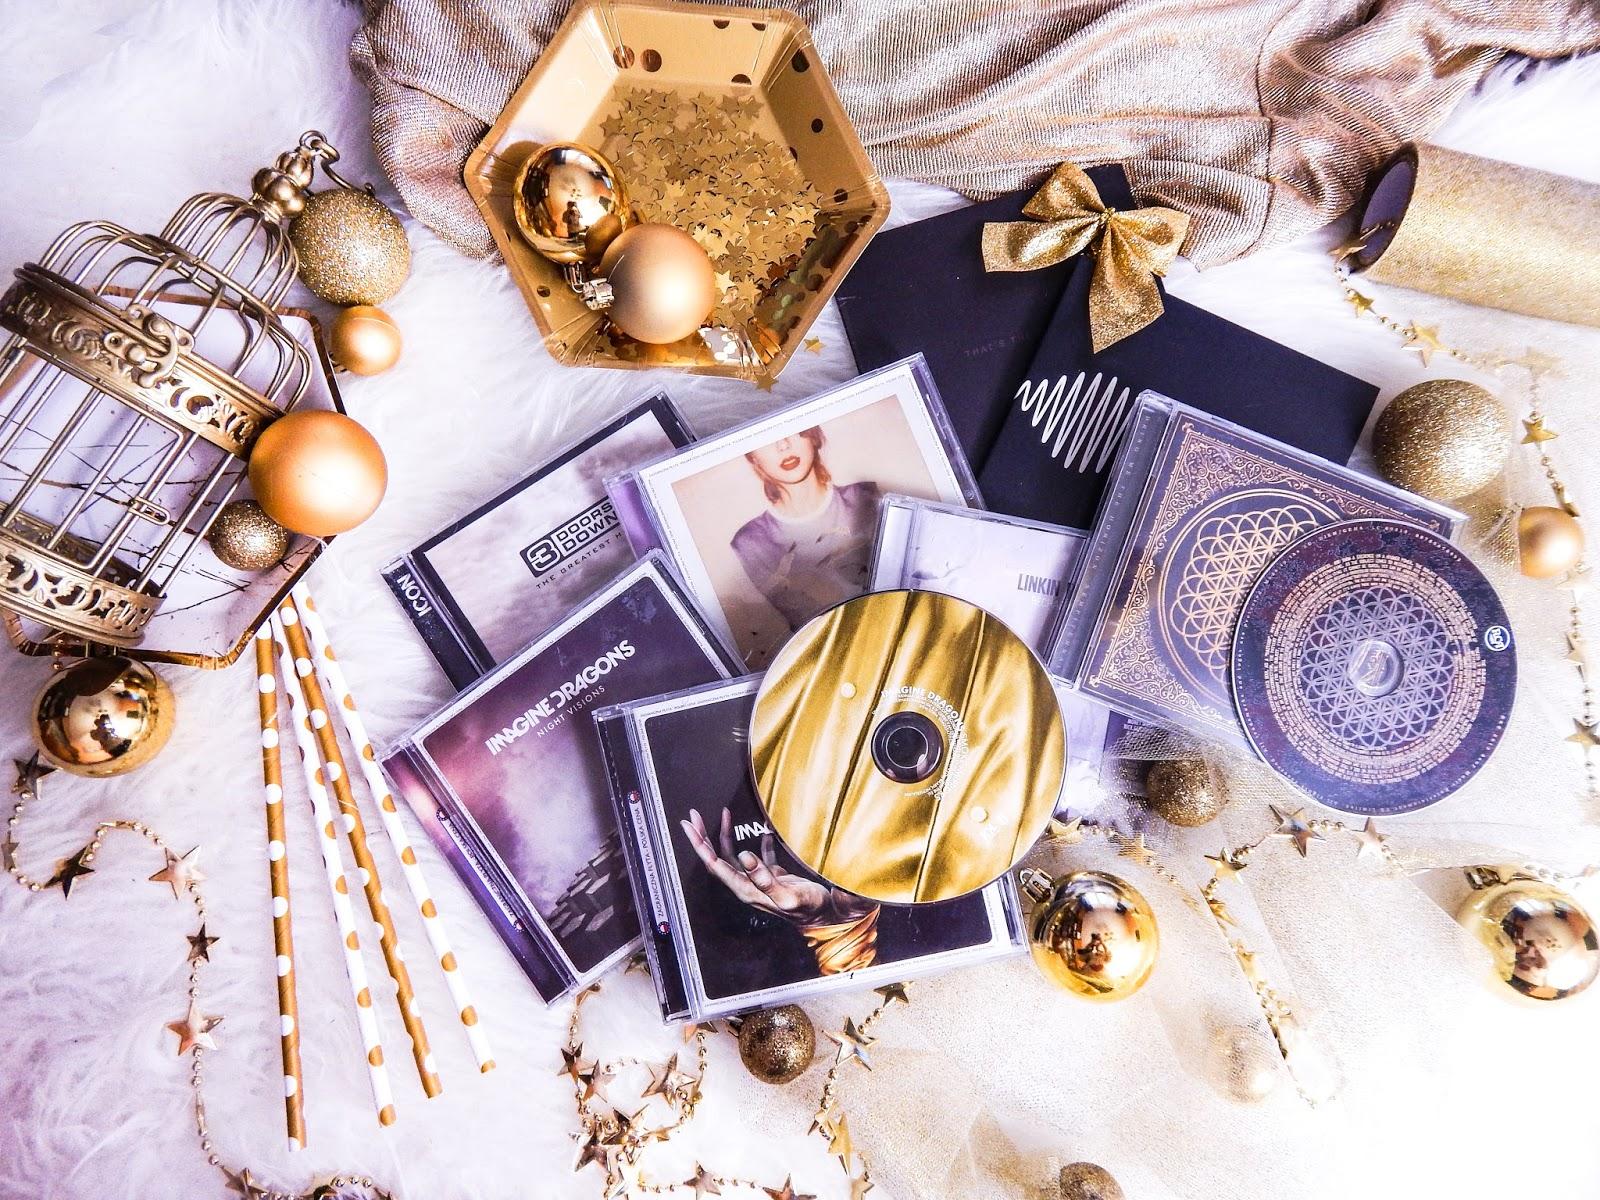 2 melodylaniella podsumowanie roku moj rok 2016 rabble party box blog lifestyle muzyka